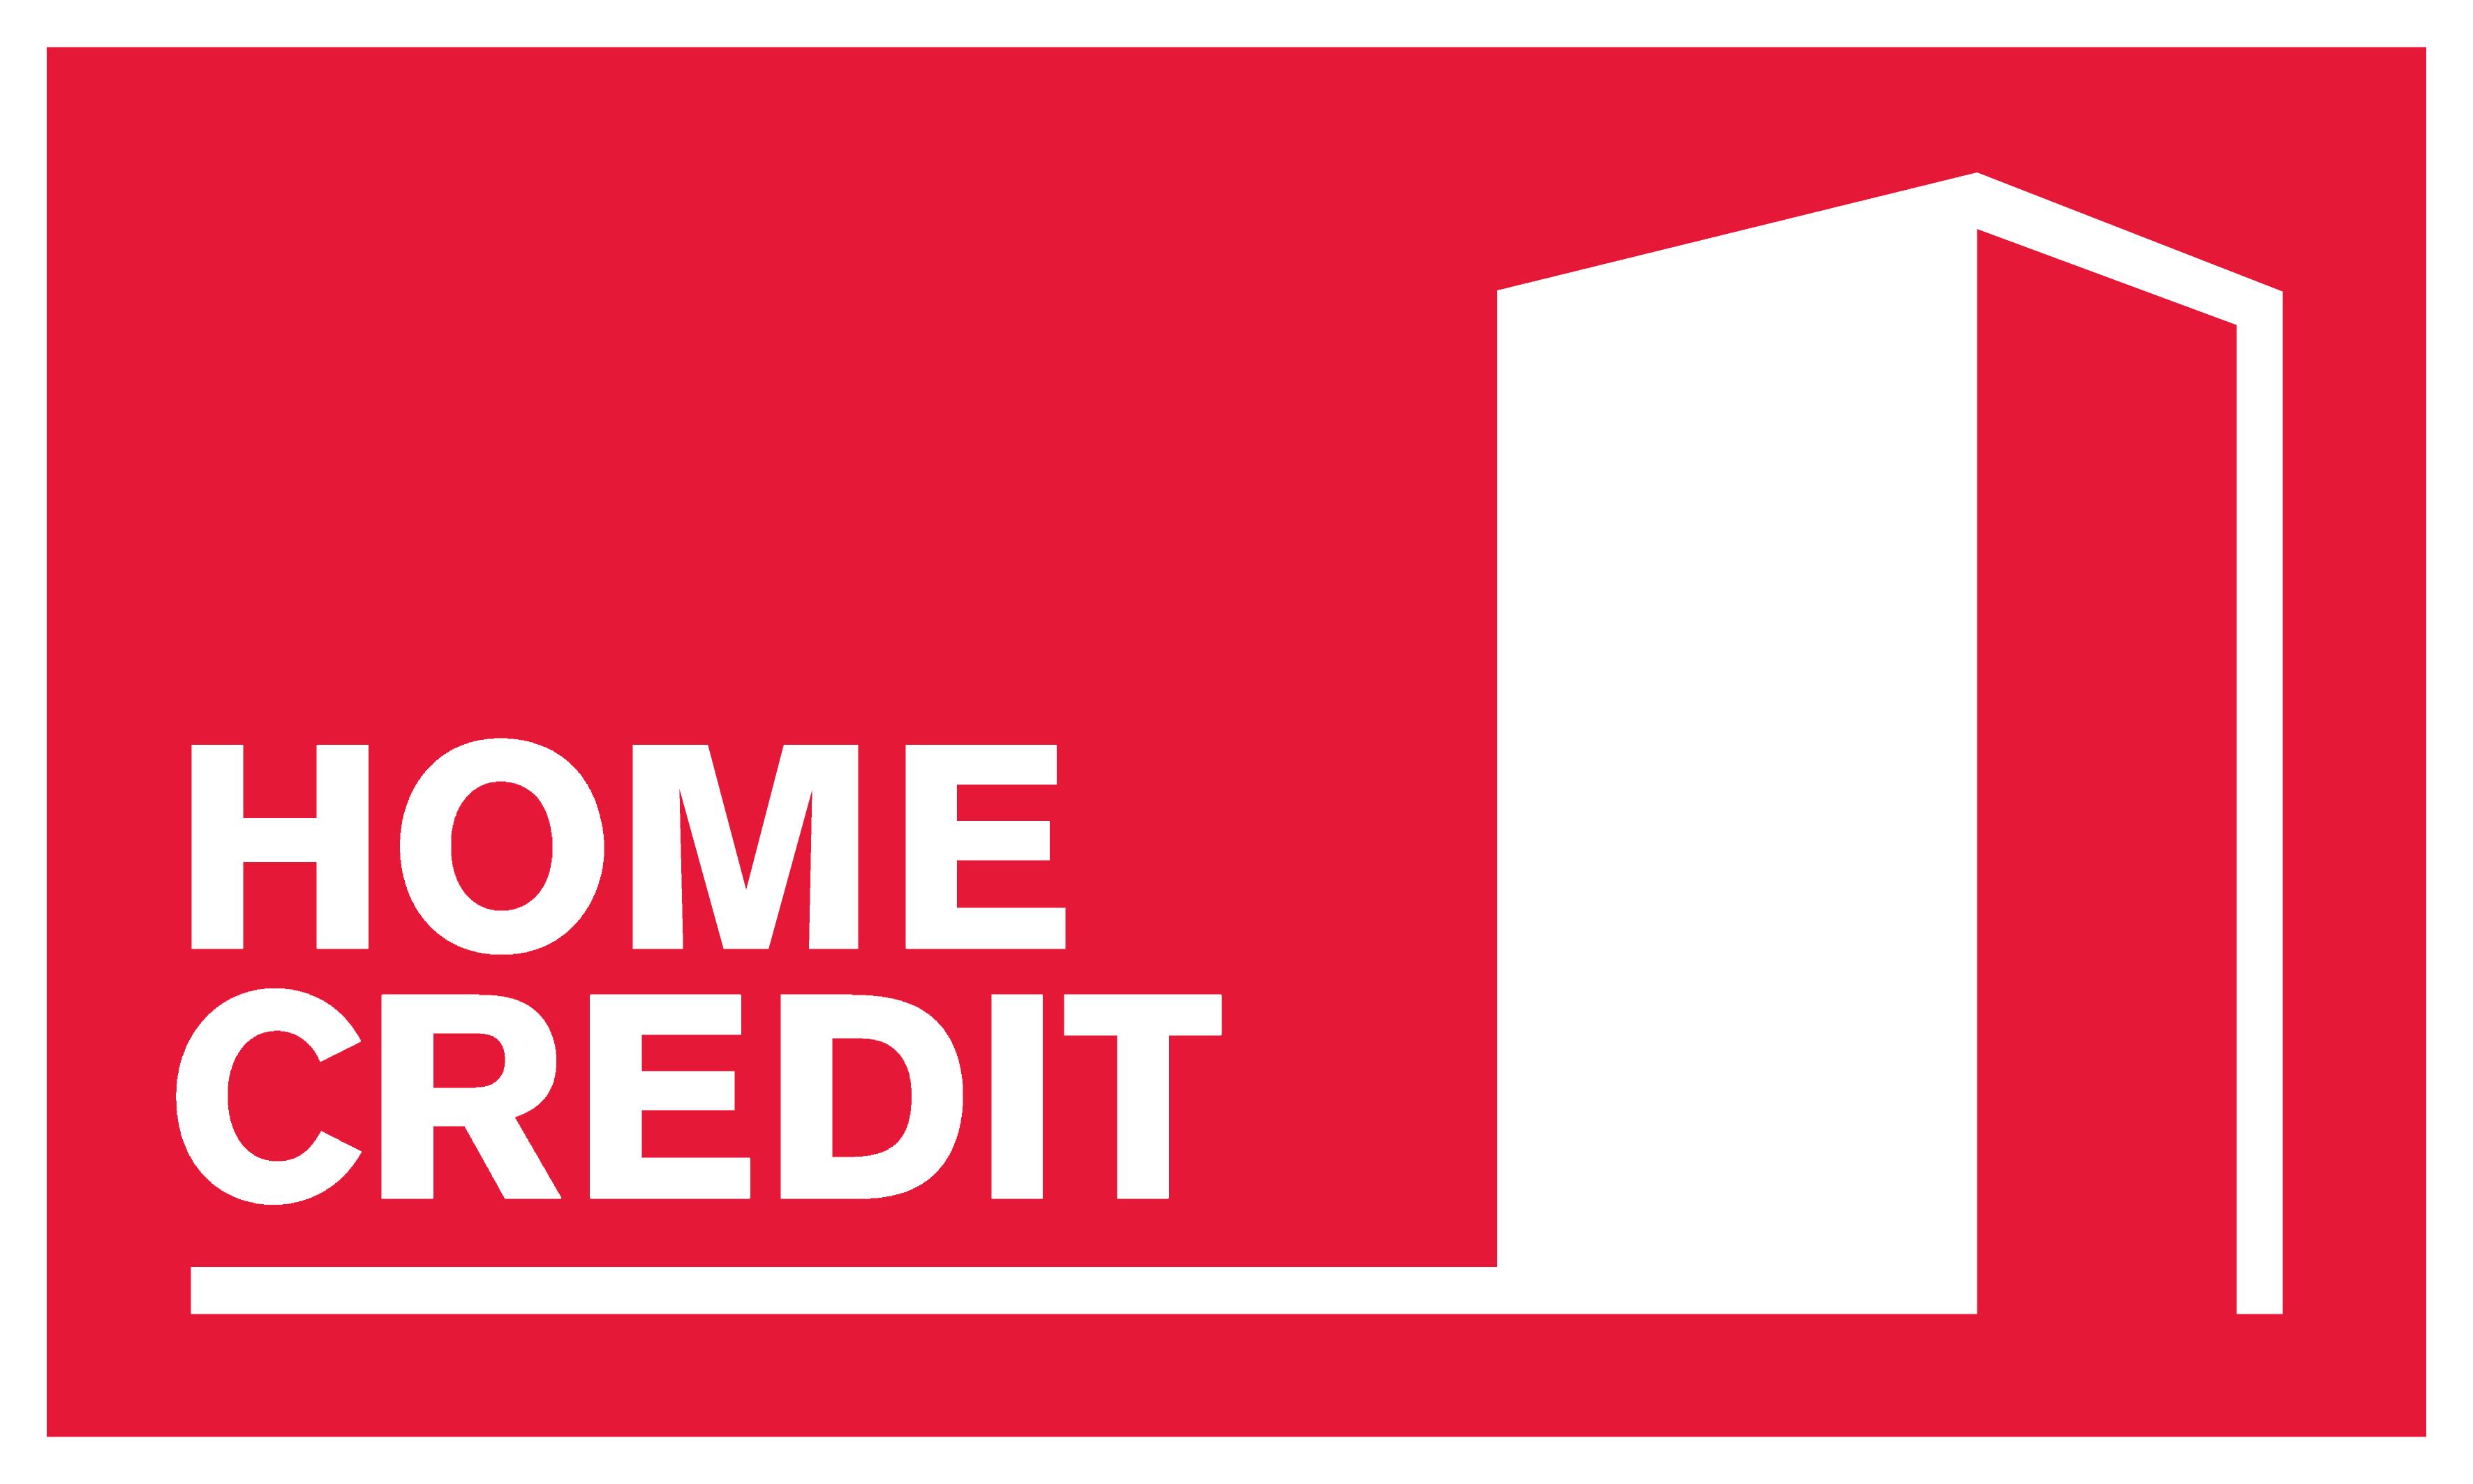 Home Credit Viet Nam